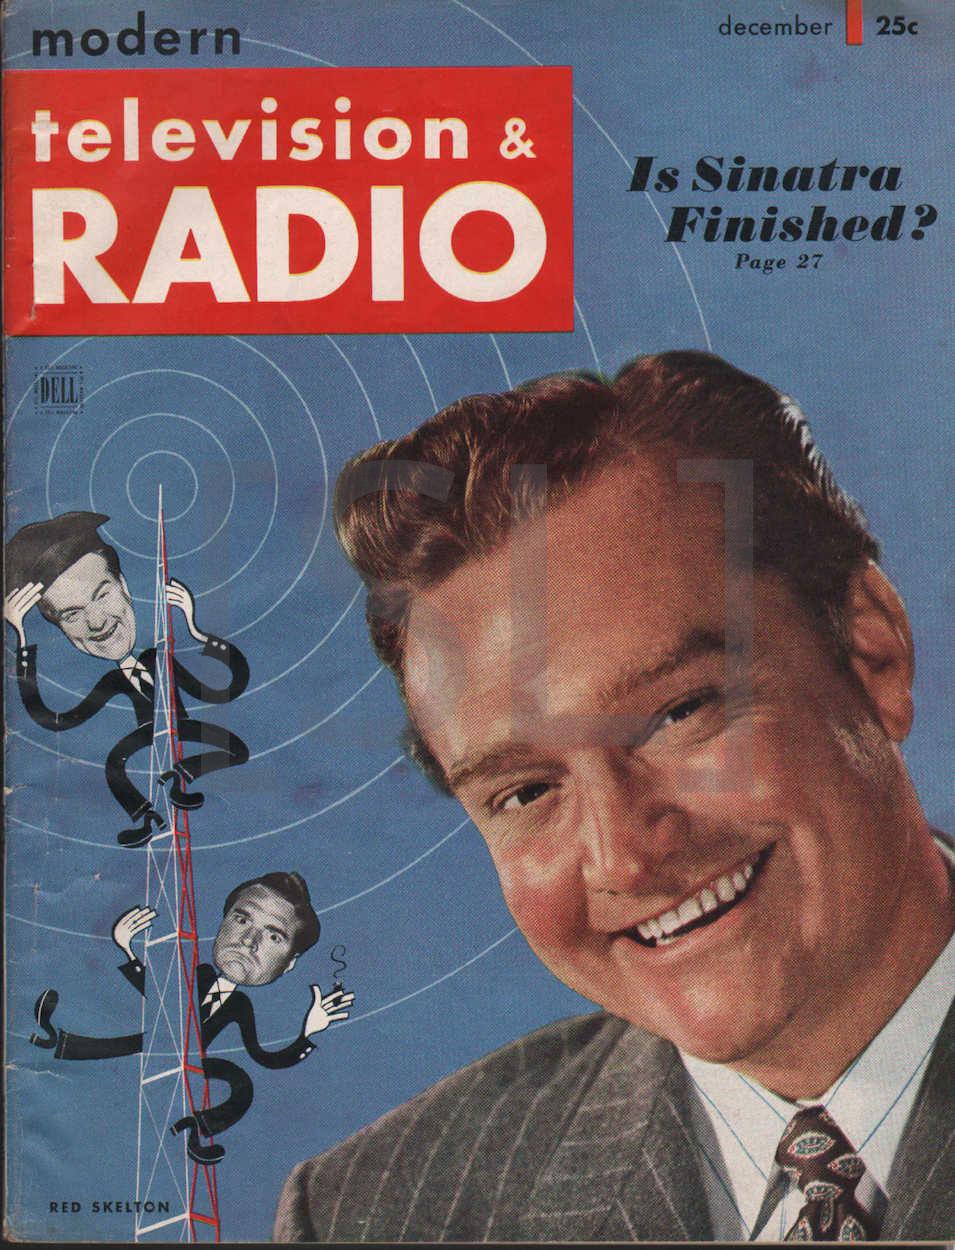 Modern Television & Radio